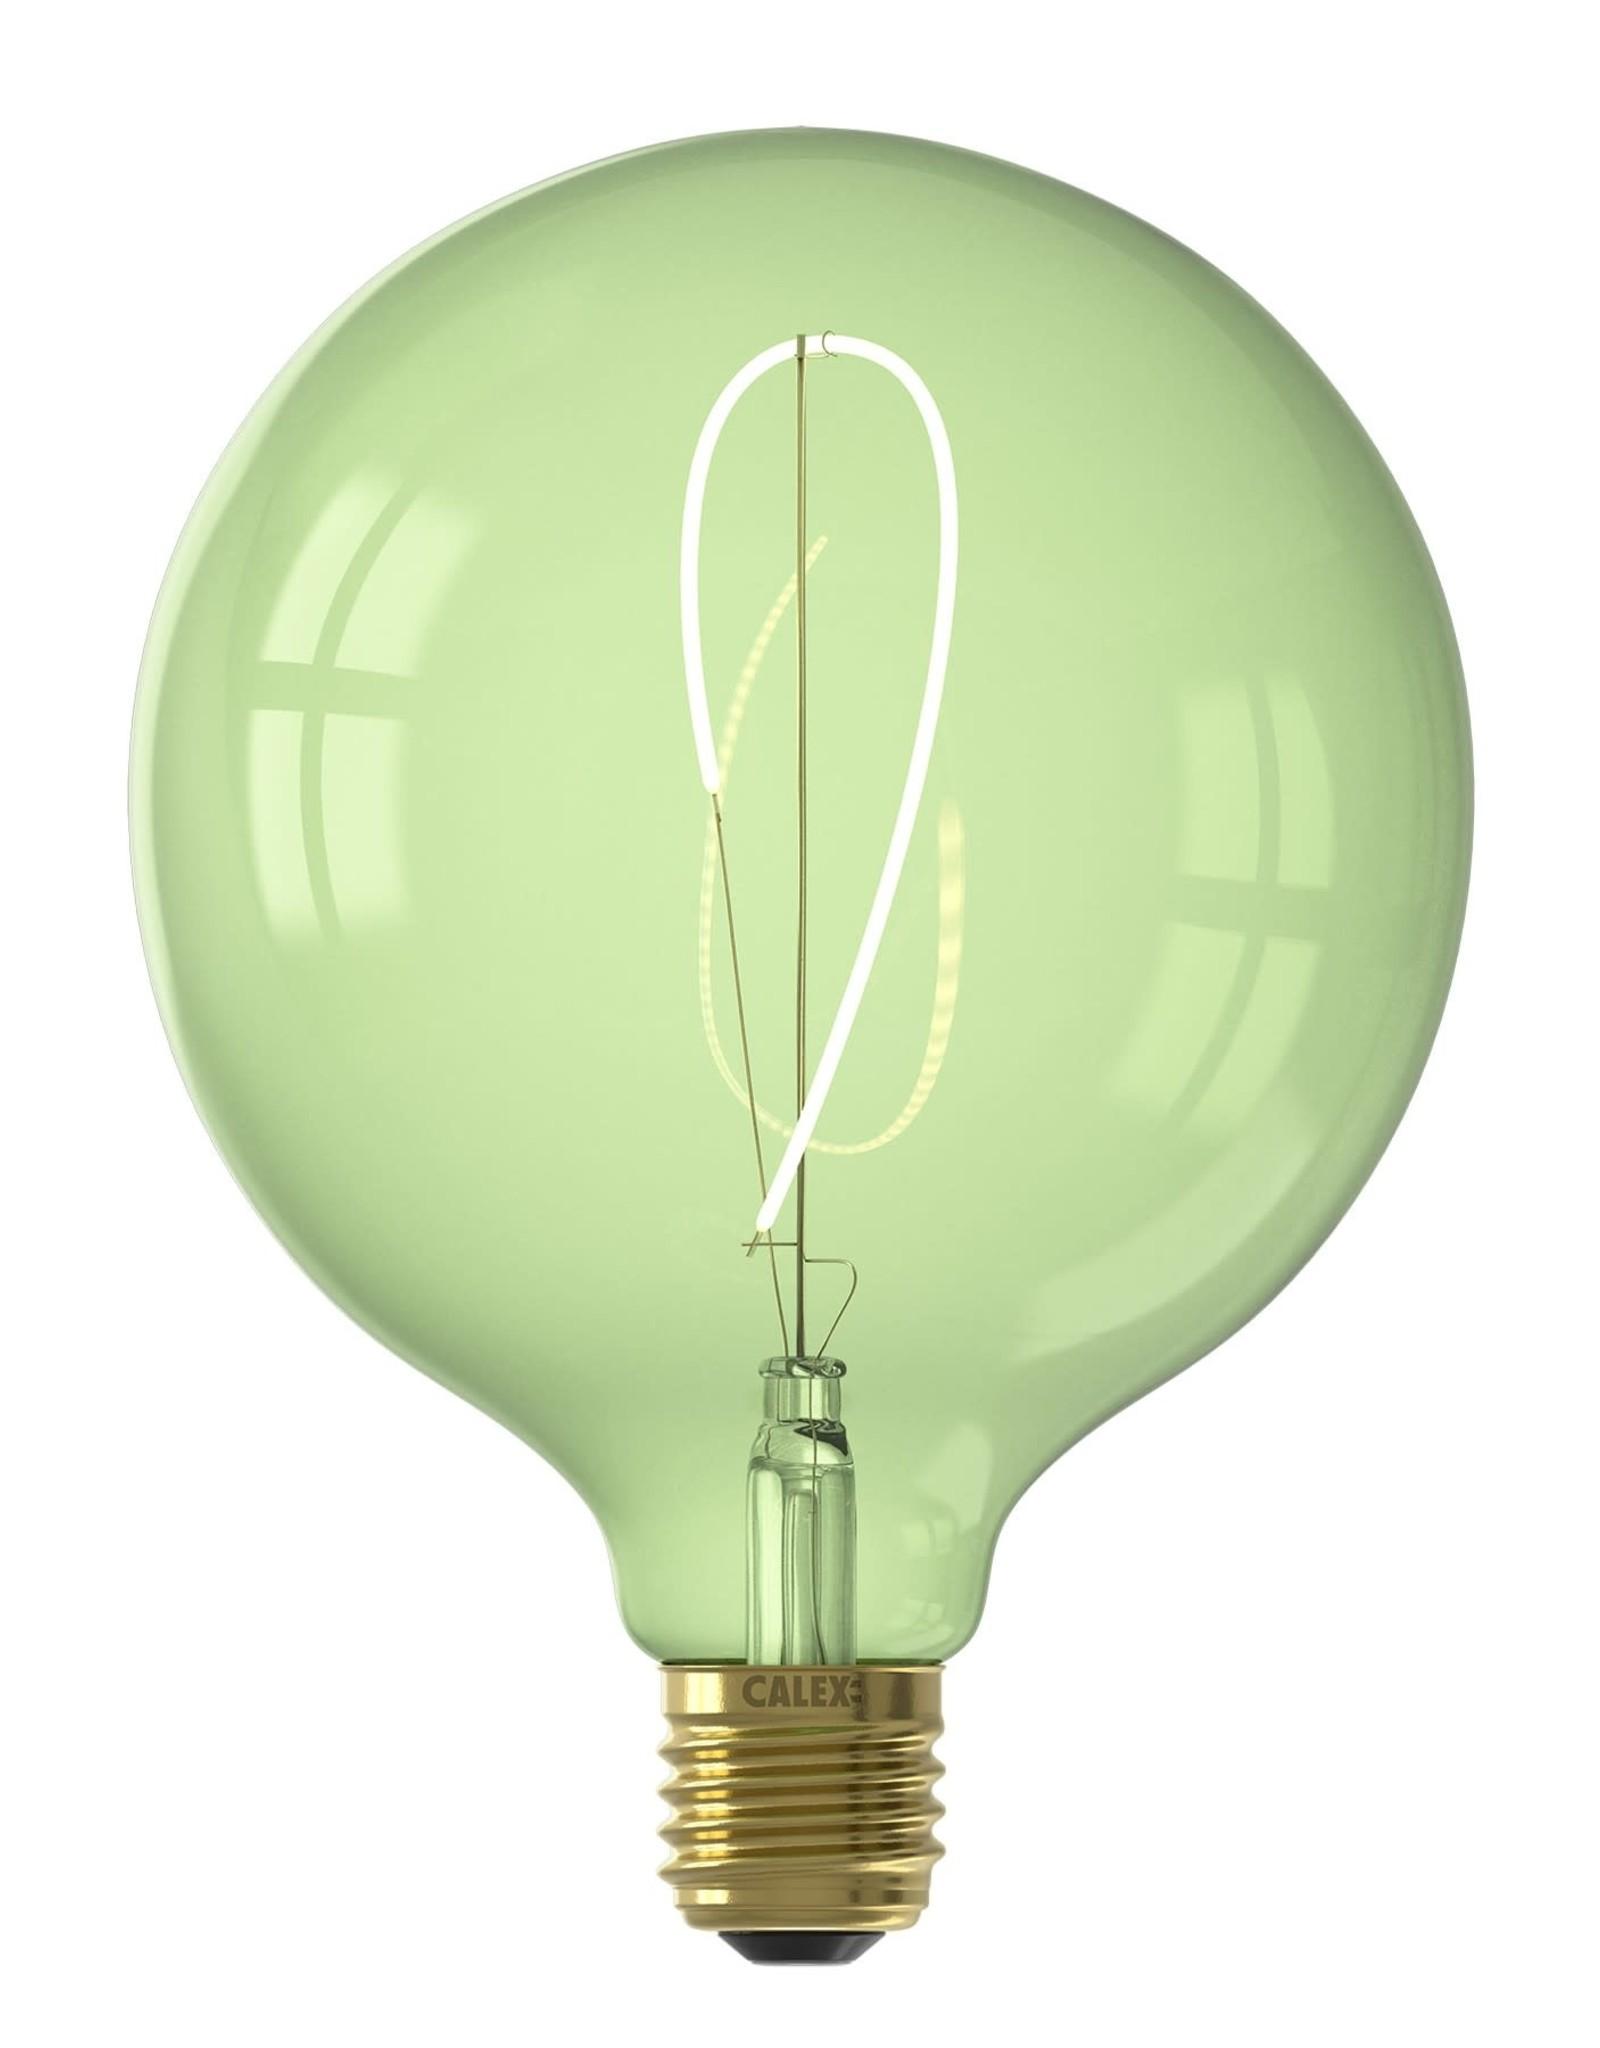 Calex NORA LED colors Globe G125 soft U-filament 240V 4W E27, Emerald Green 2200K dimmable, energy label B